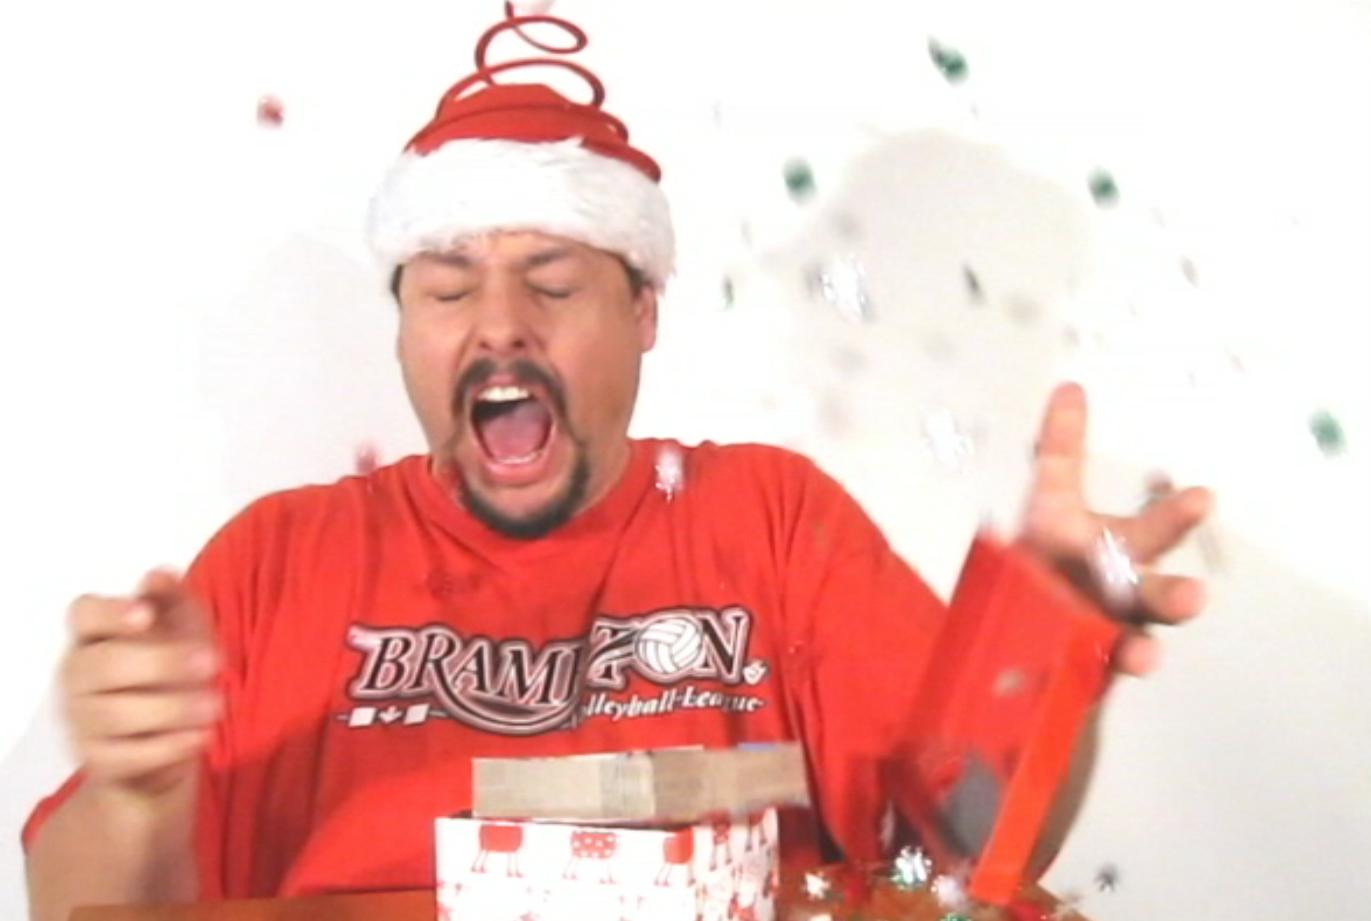 the fun, surprising, exploding gift box